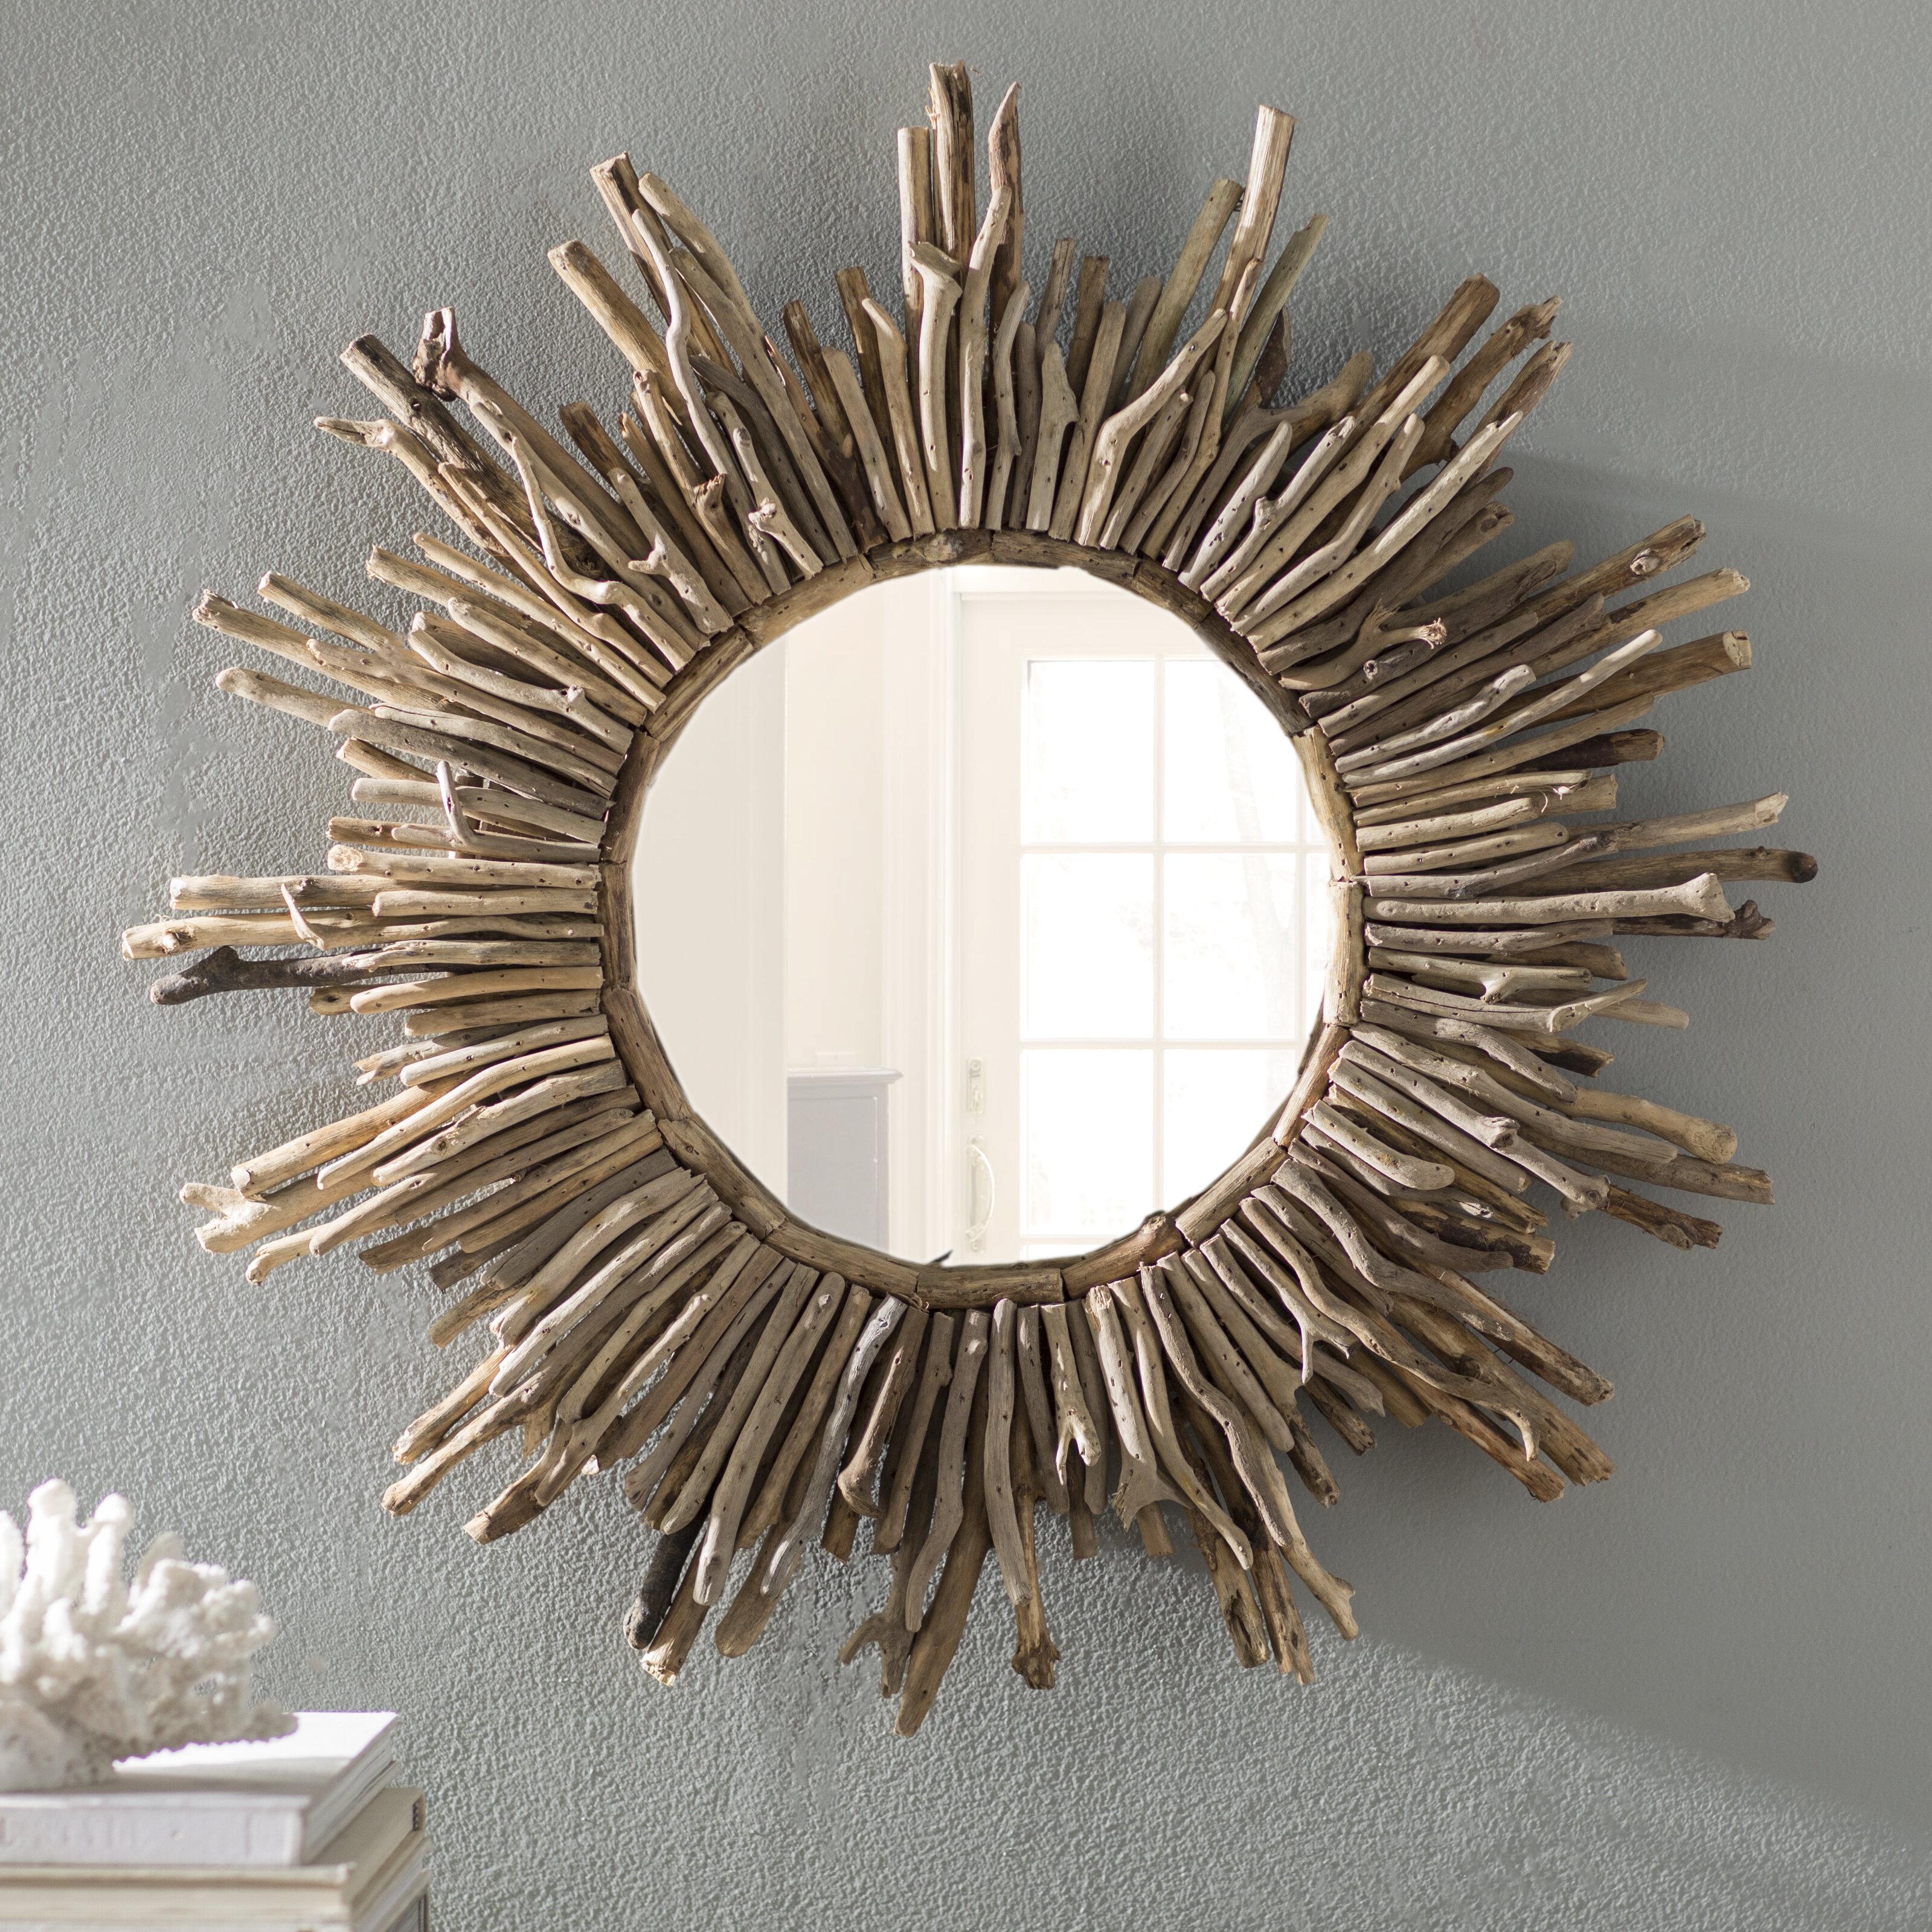 Sunburst Traditional Accent Mirror For Birksgate Sunburst Accent Mirrors (View 5 of 20)